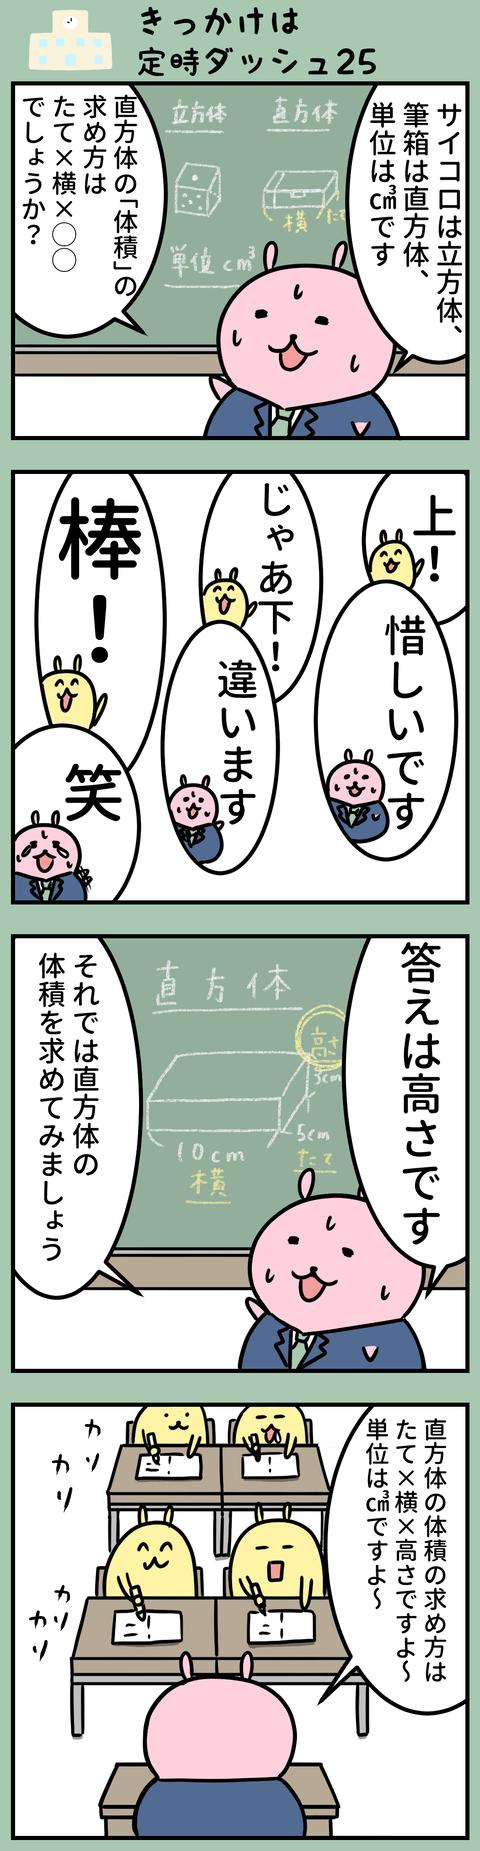 manga-yuzuporo84-1